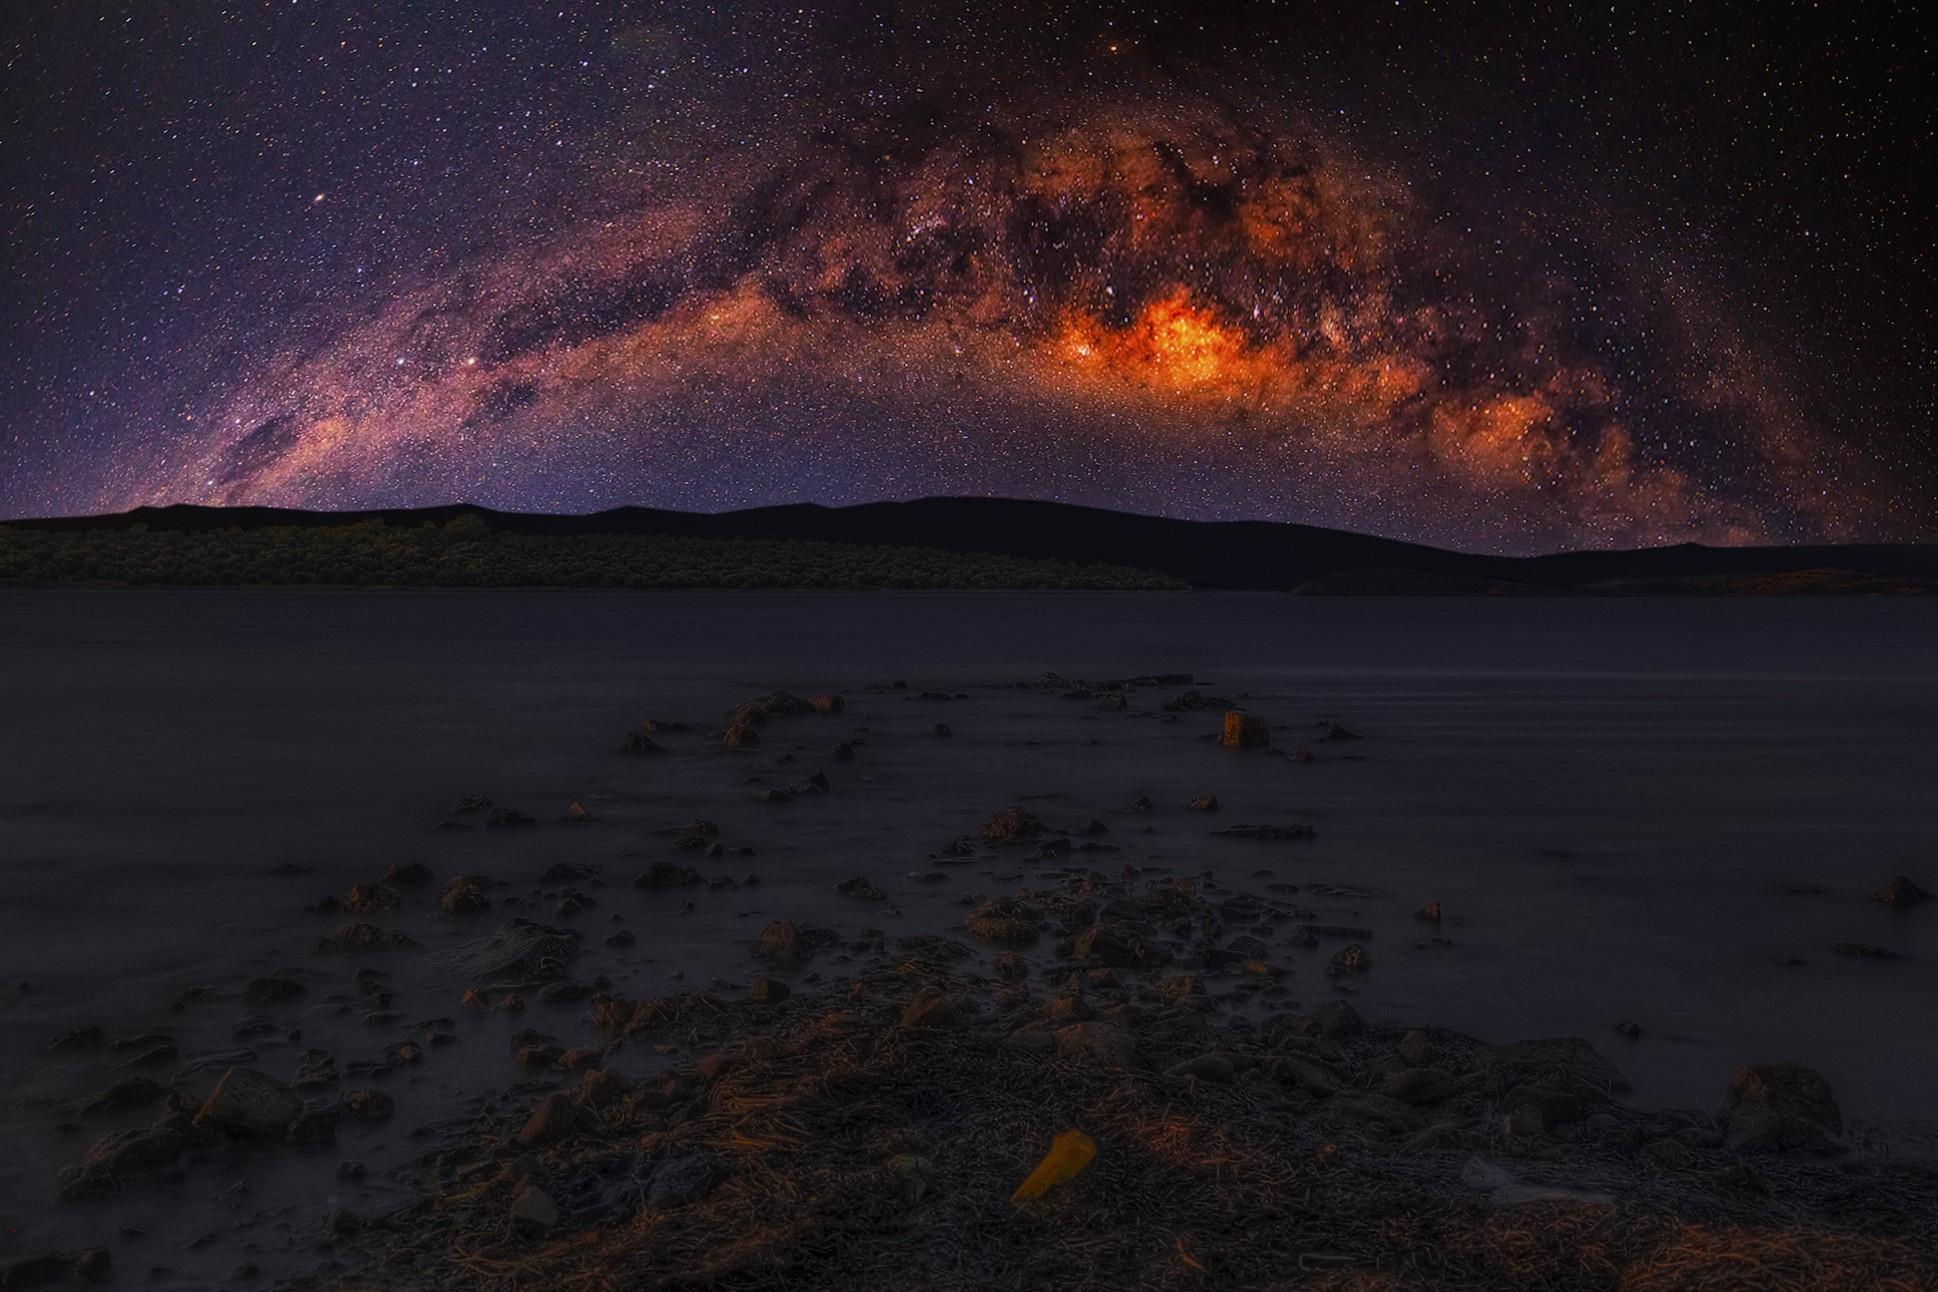 General 1938x1292 landscape Milky Way skyscape stars starry night photomontage